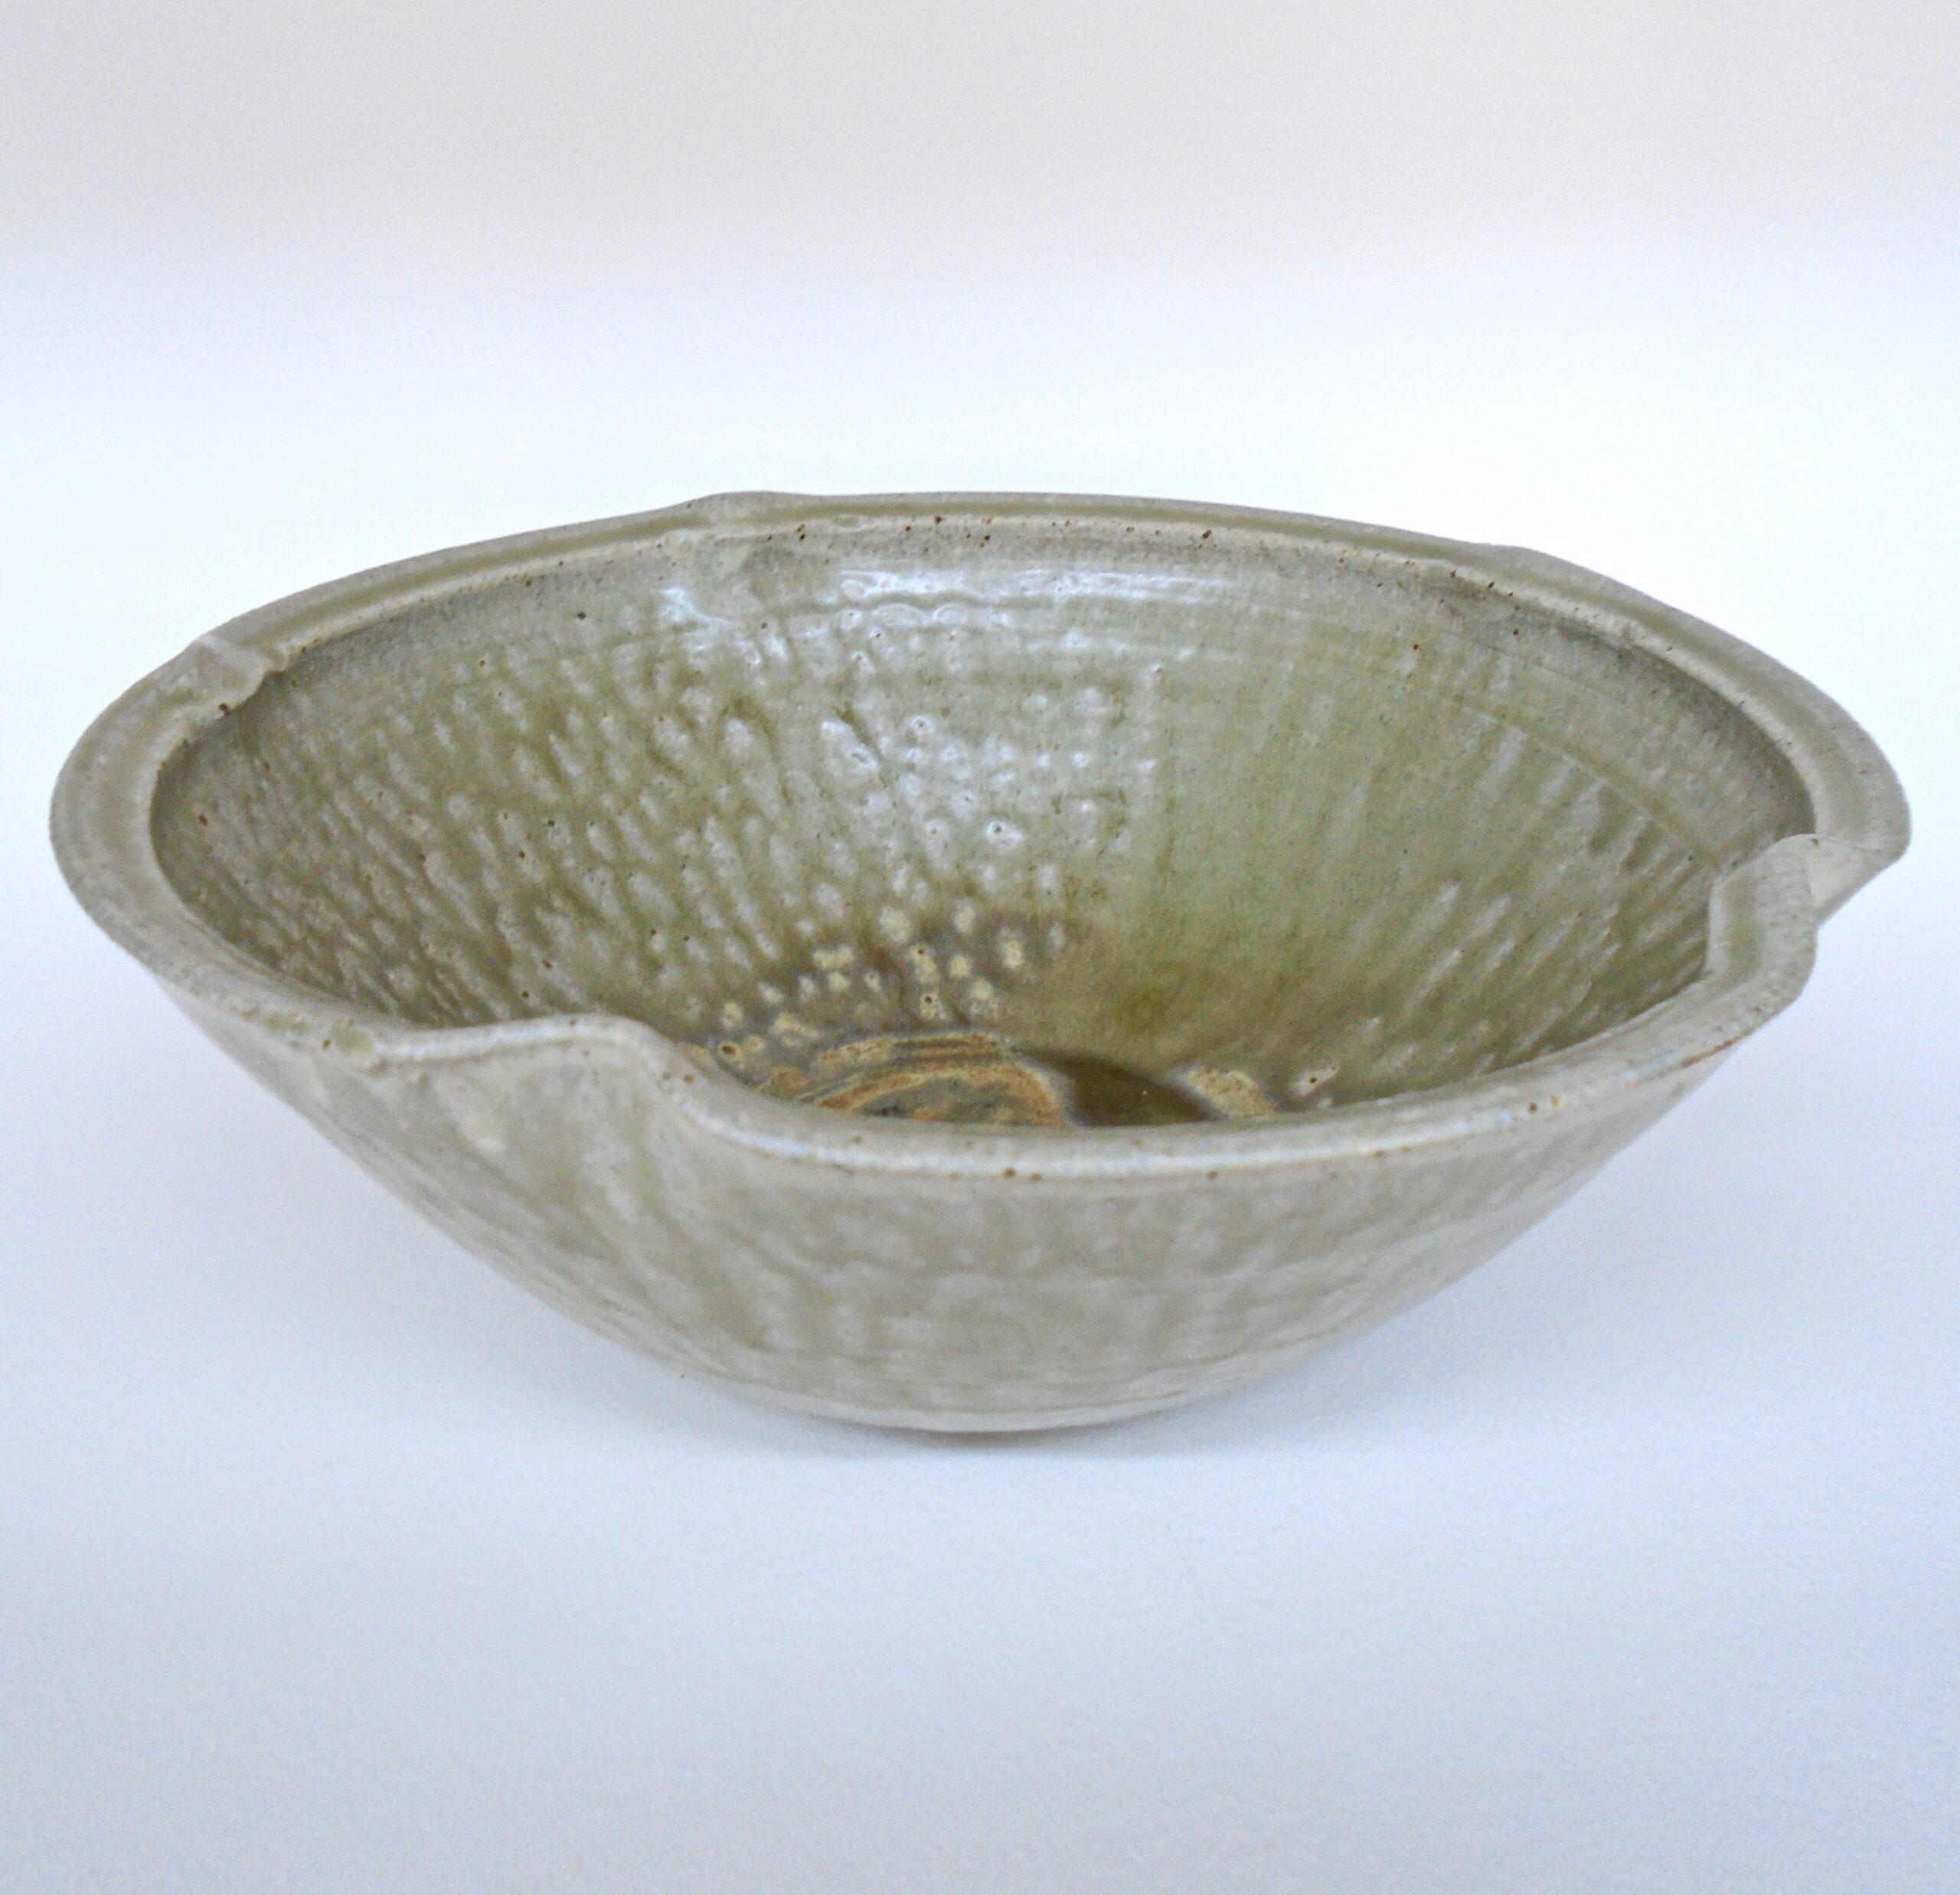 JL47: Ashy Lobe Bowl